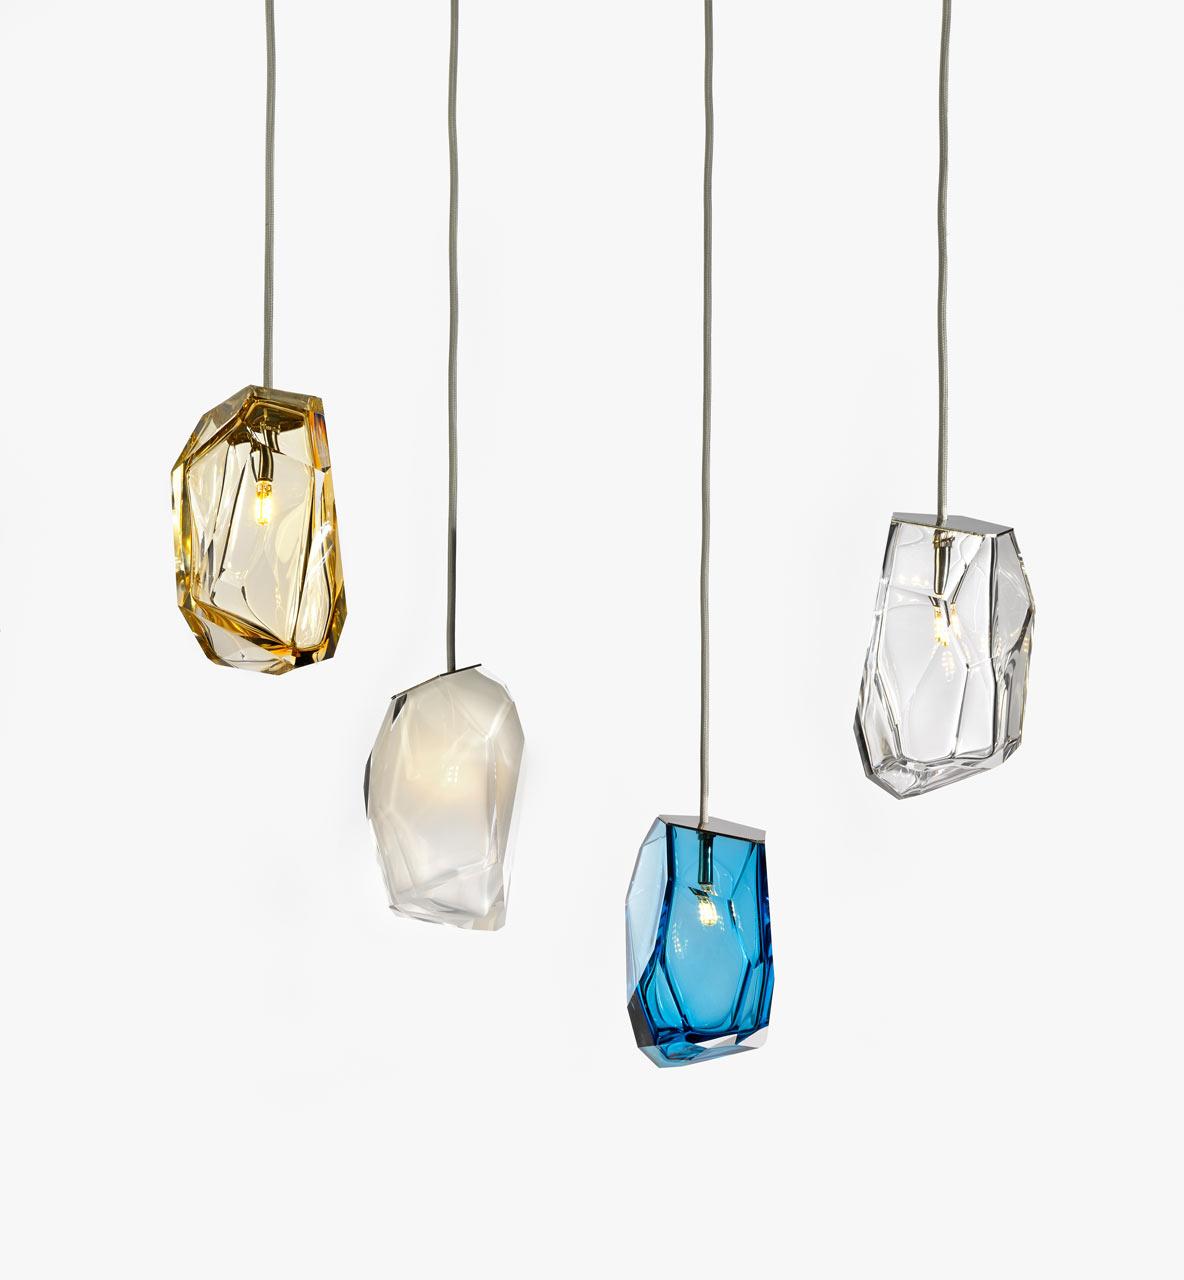 Arik-LEVY-Crystal-Rock-Lighting-2